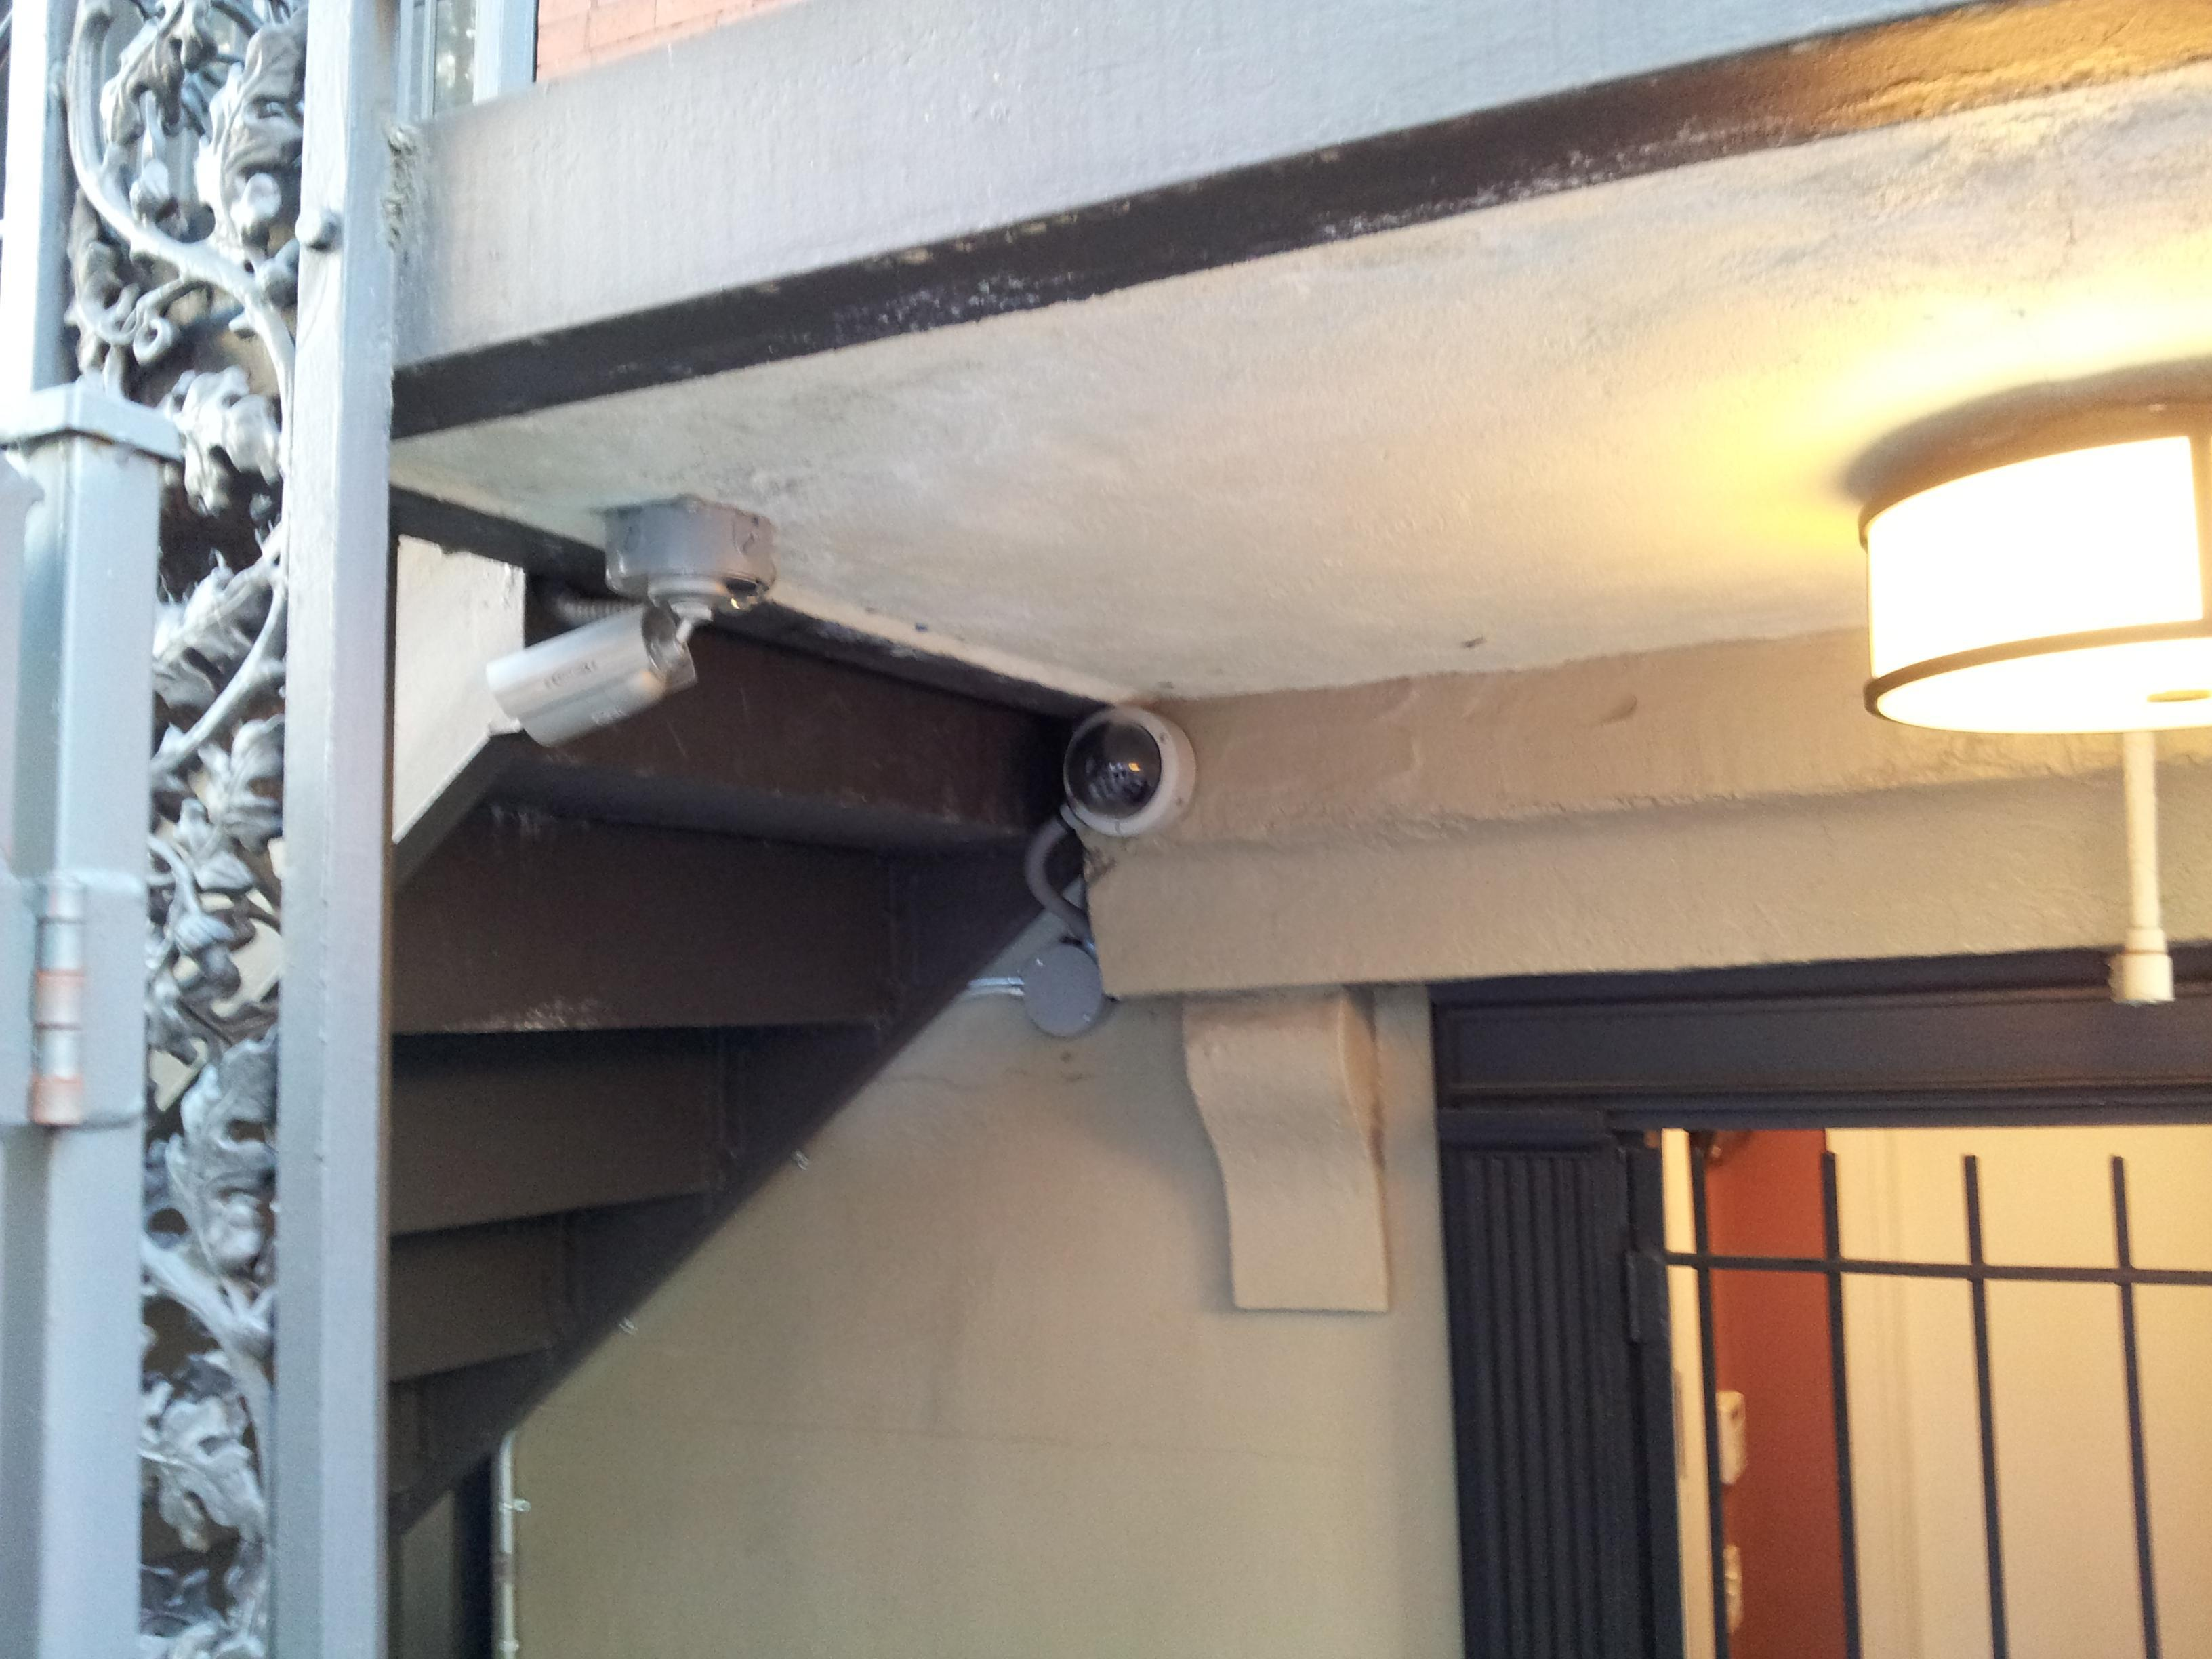 Honeywell CCTV cameras mounted on ceiling